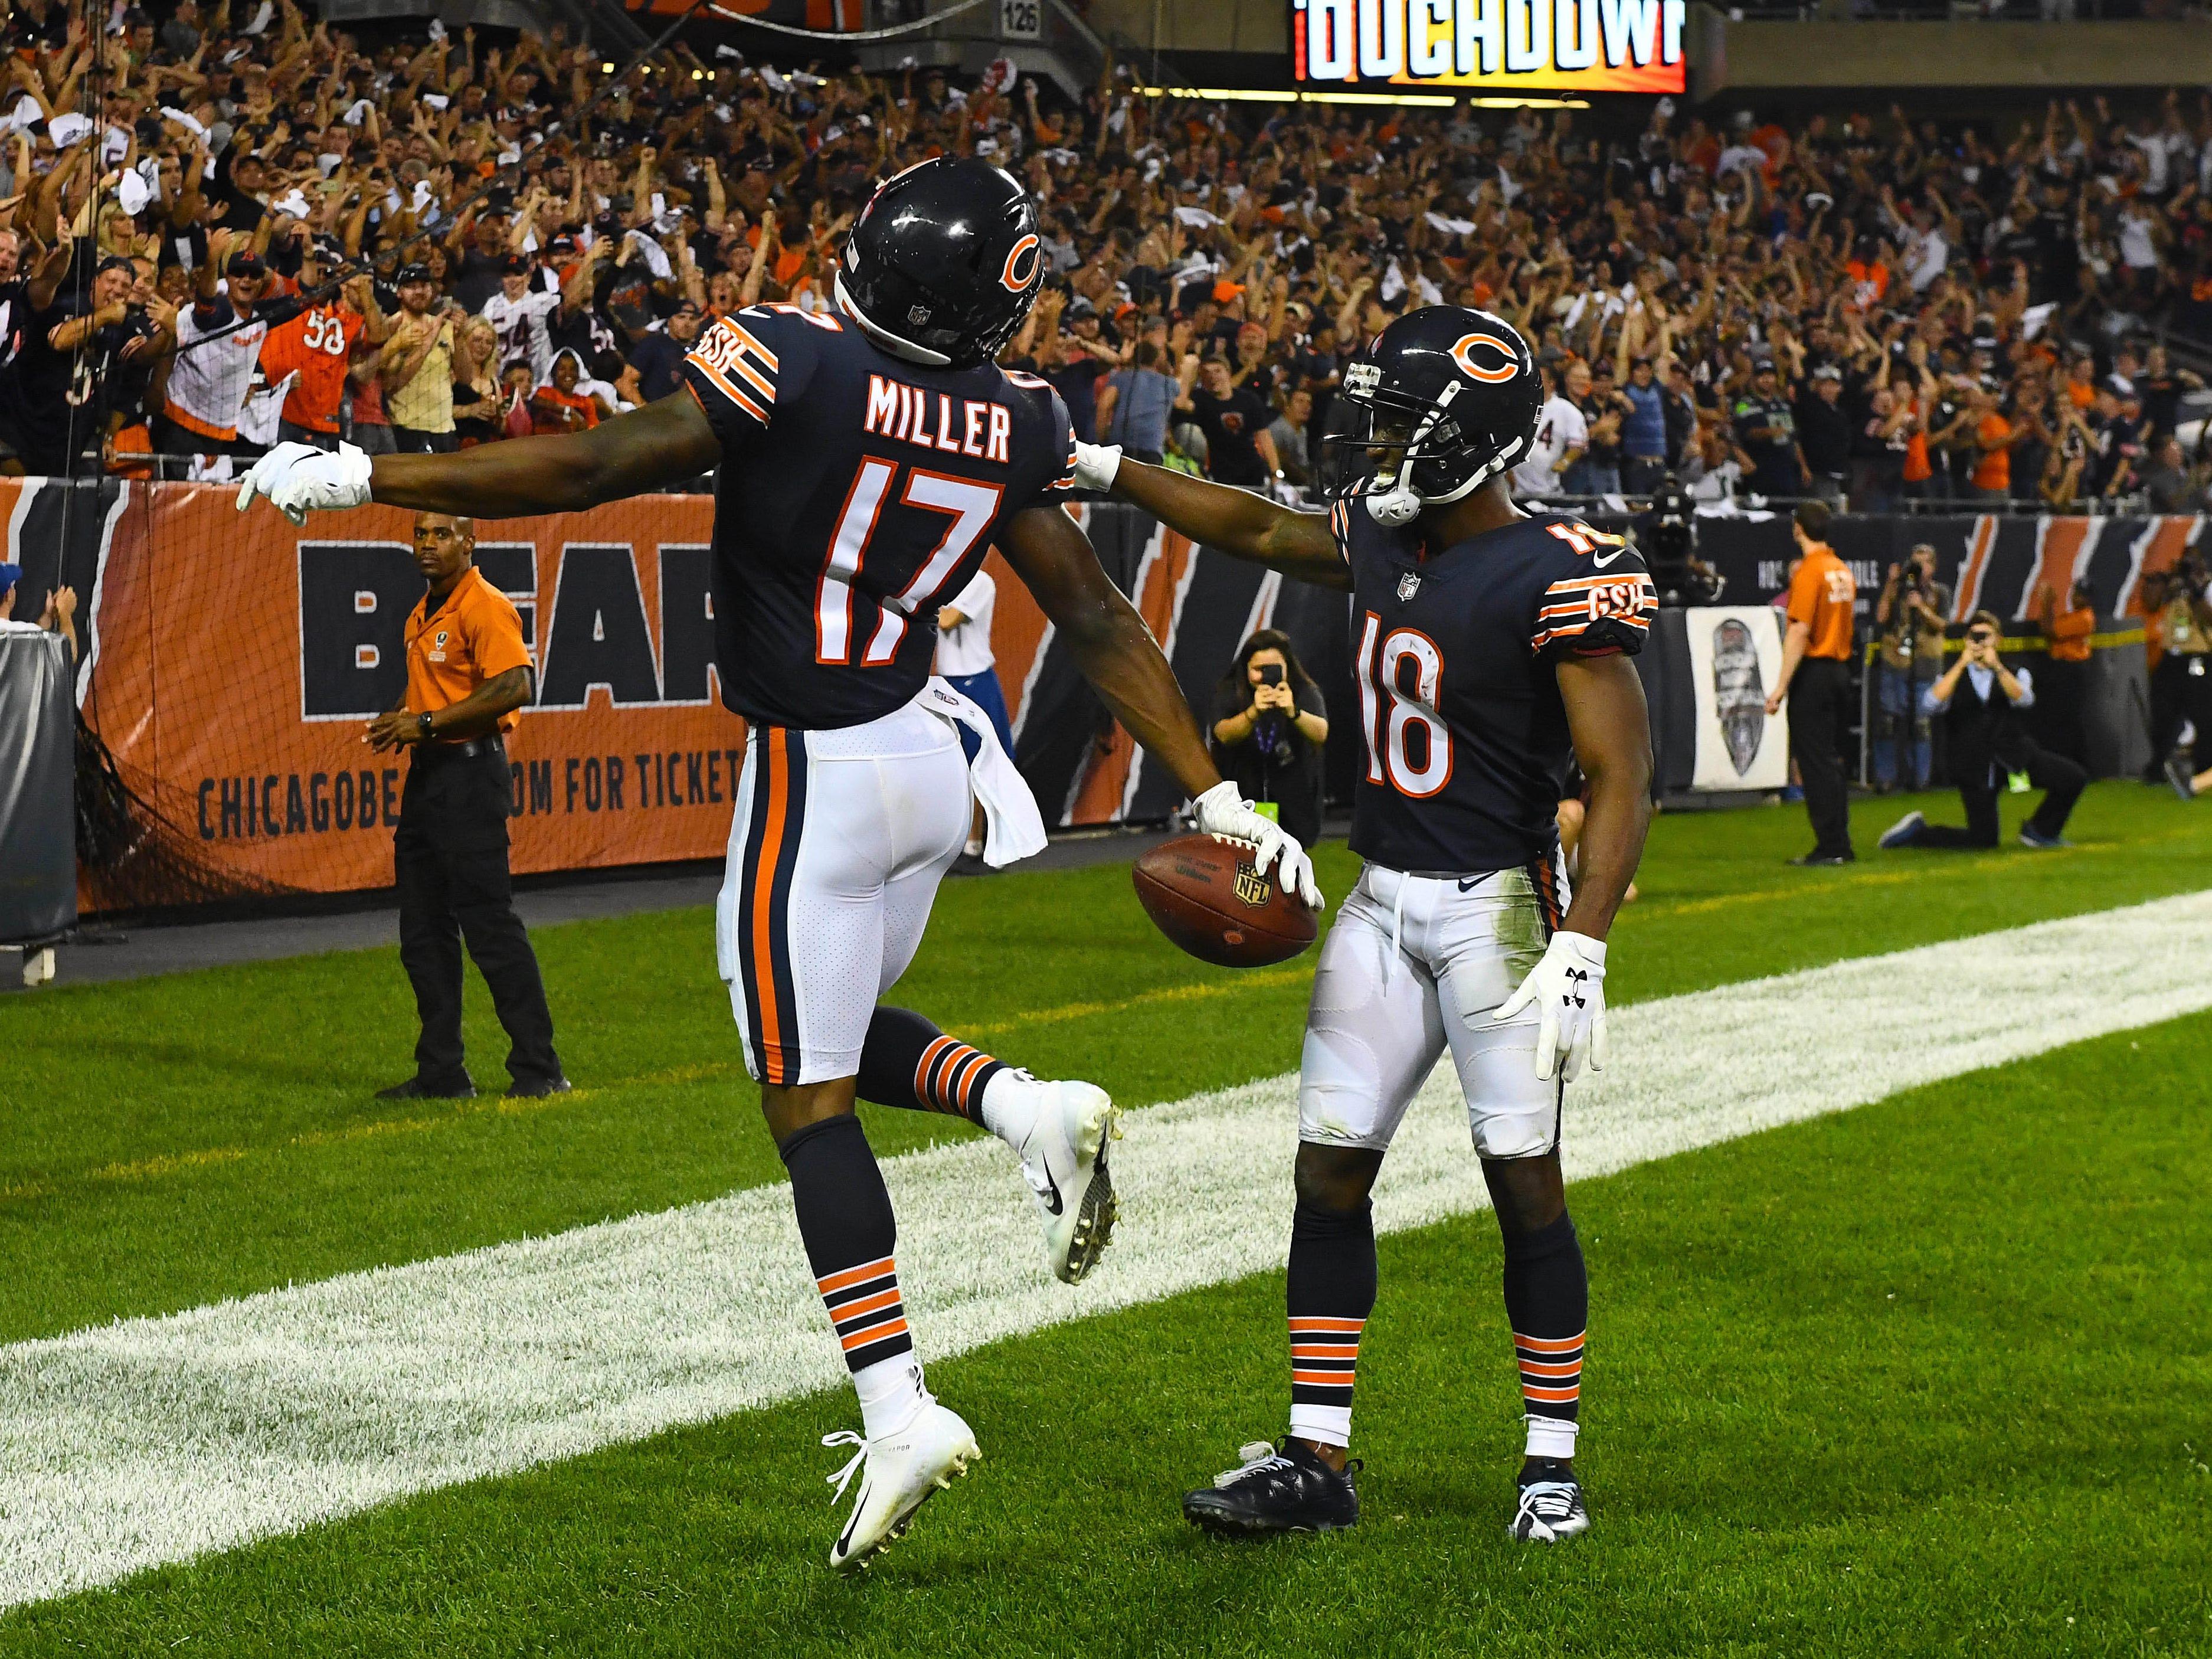 7. Chicago Bears